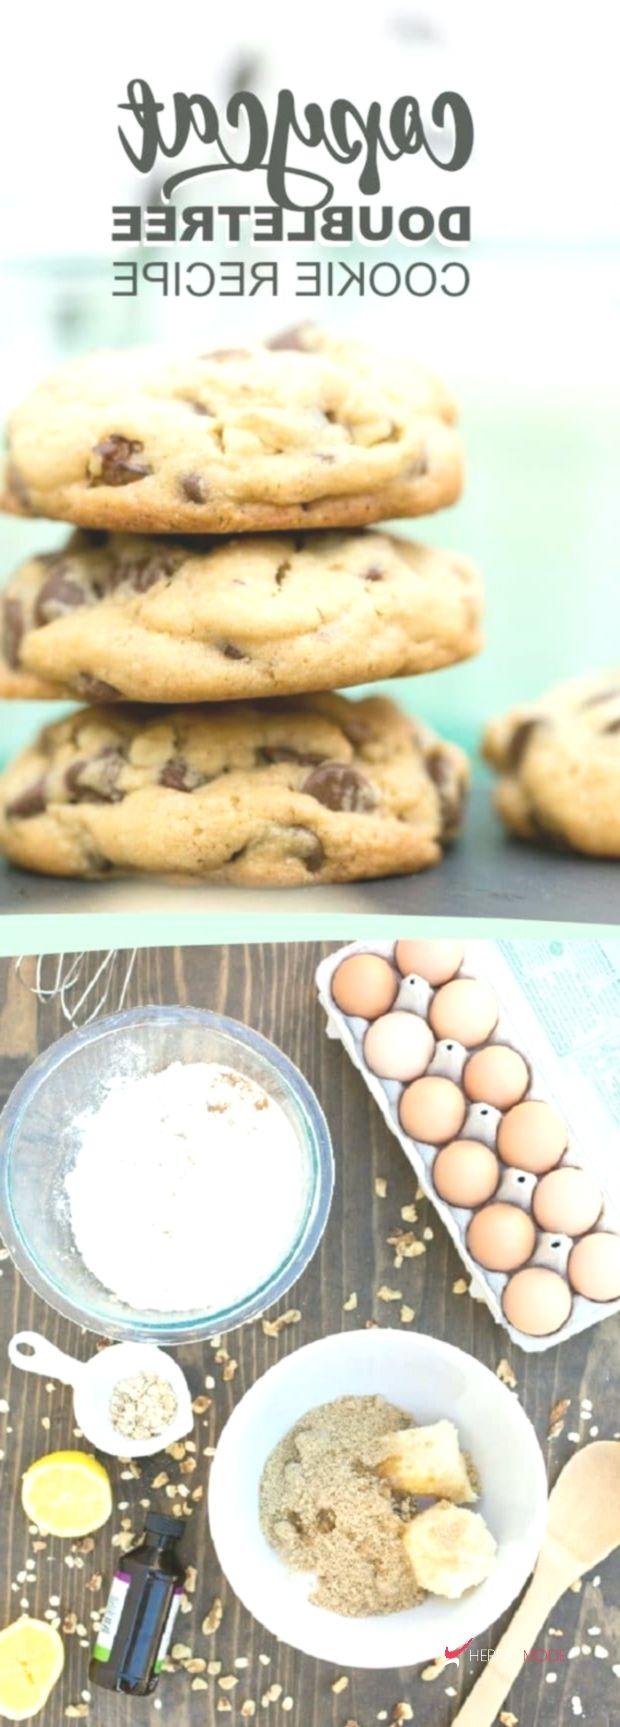 Best doubletree cookie recipe – copycat of the famous cookie recipe from Hilton … – Herren Mode